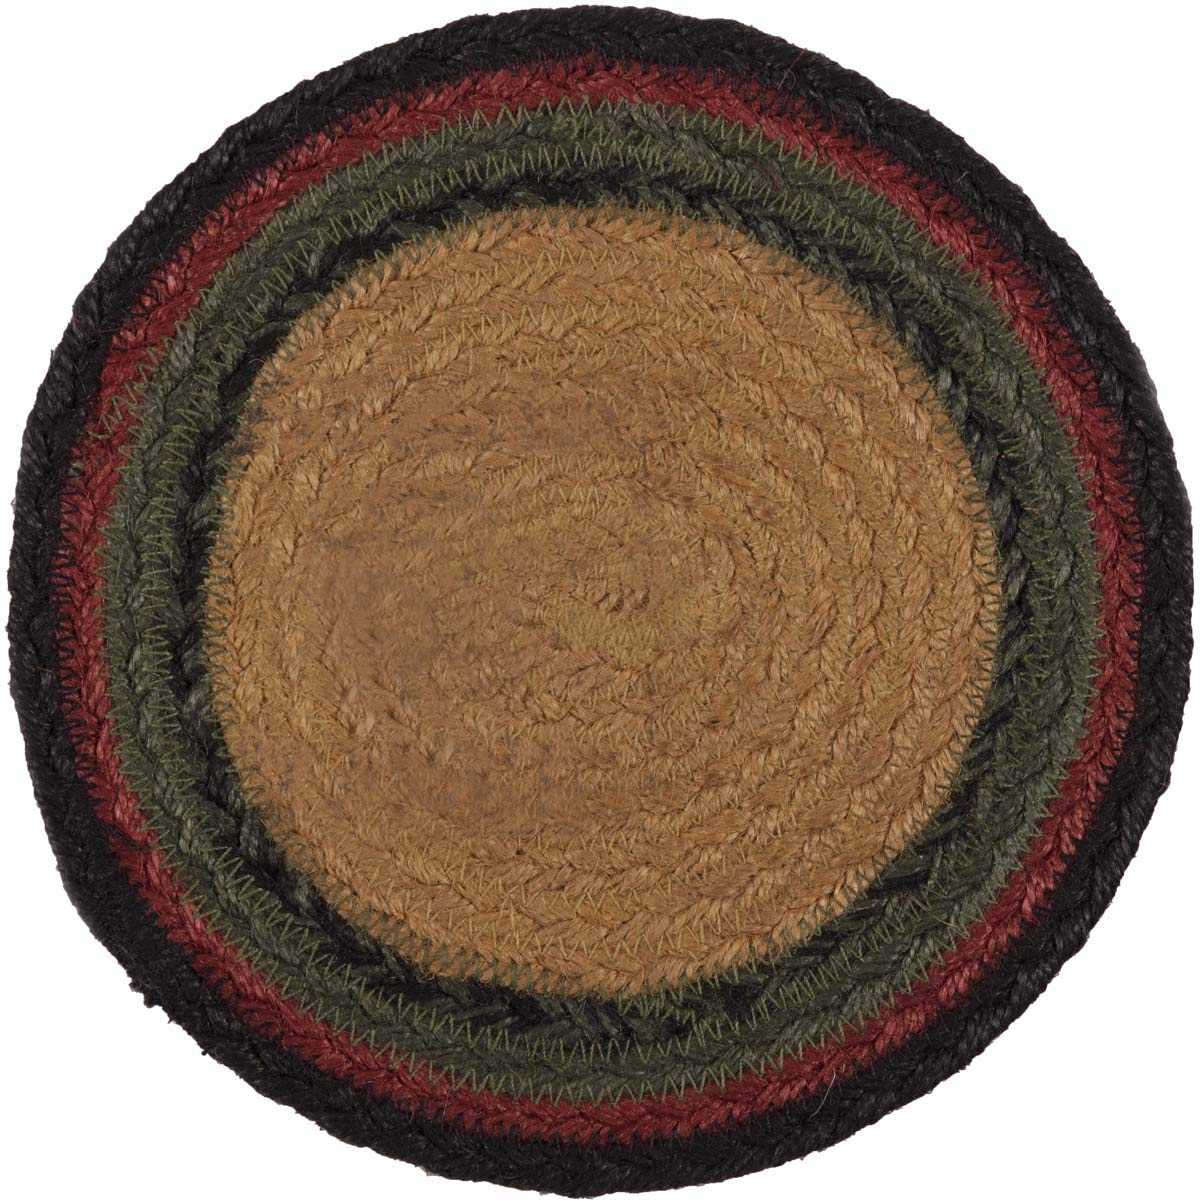 VHC Brands Rustic /& Lodge Tabletop /& Kitchen Red Wyatt Tan Bear Jute Trivet